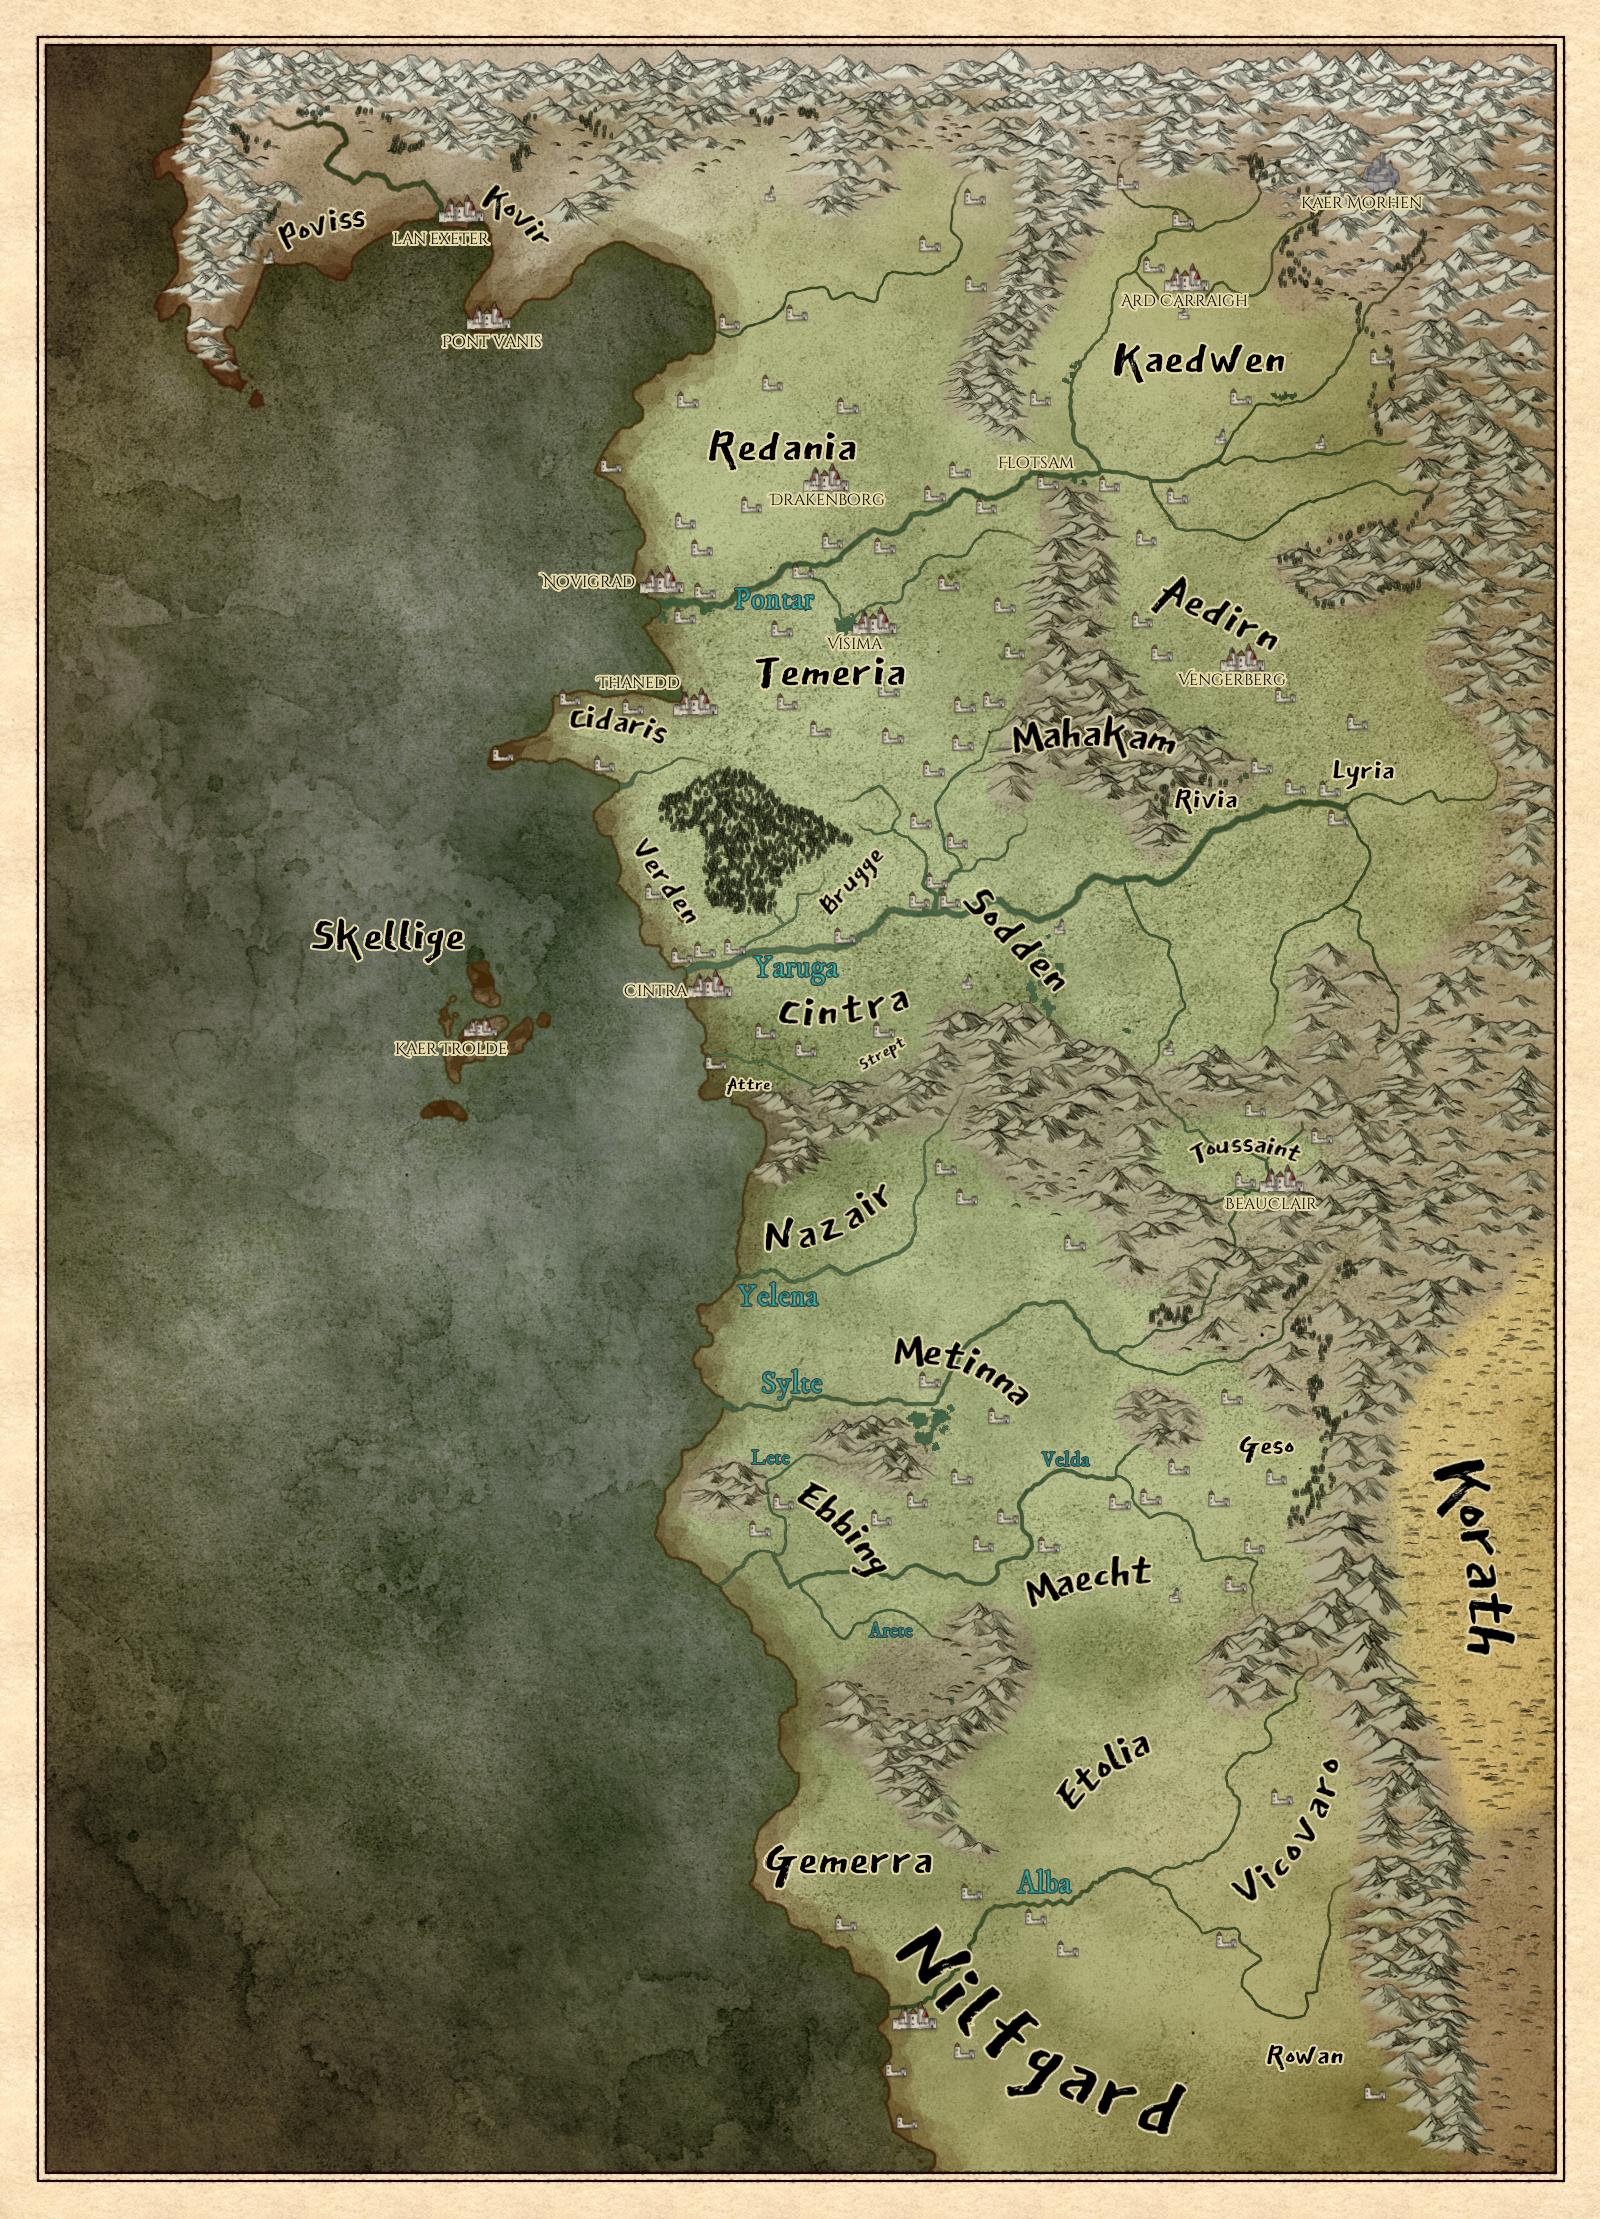 Witcher 3 Toussaint Map : witcher, toussaint, Witcher, World, Witcher,, Fantasy, Books